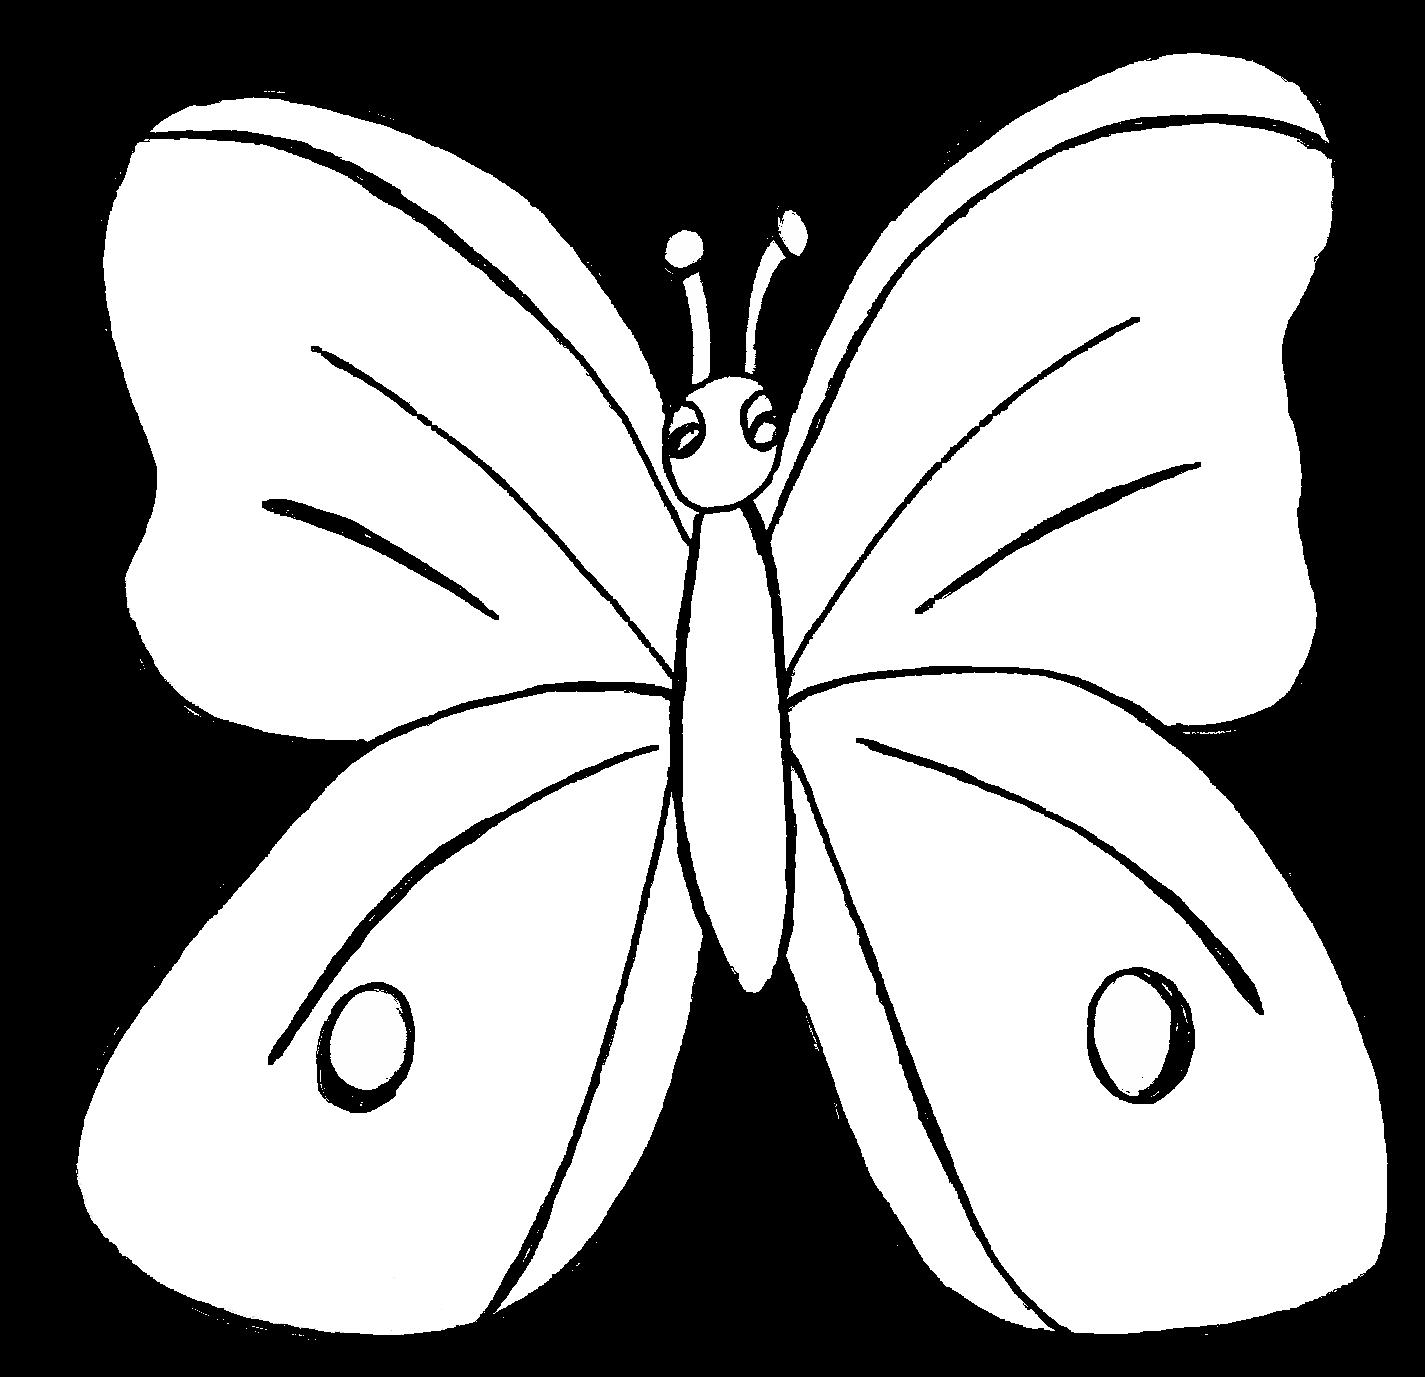 Clip Art By Carrie Teaching First Rain Forest Doodles